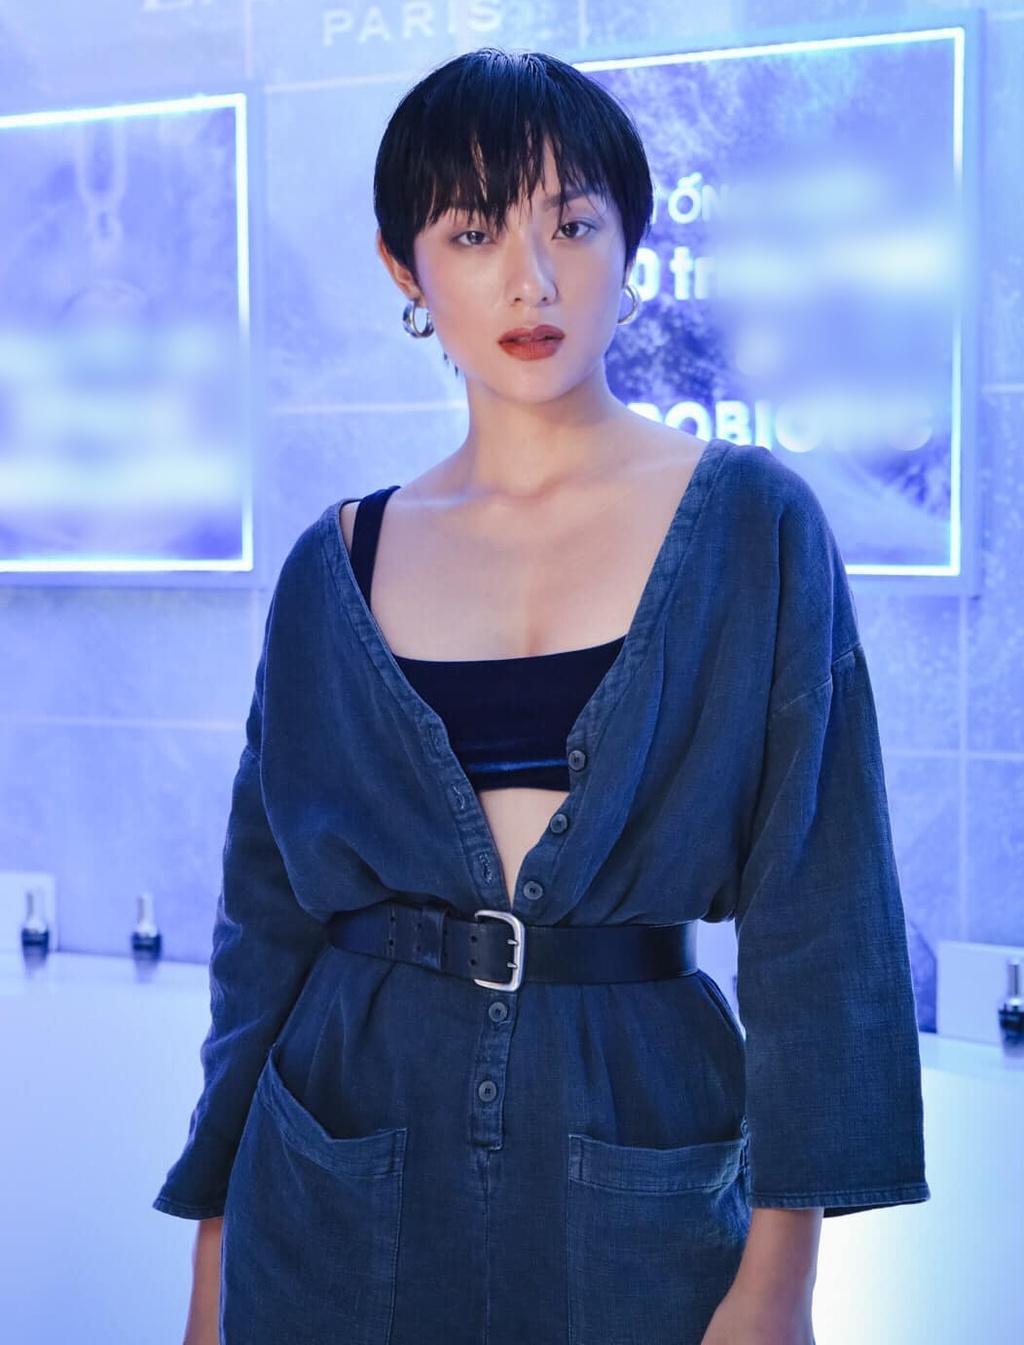 Dan hot girl Viet noi tieng nho dong MV hinh anh 9